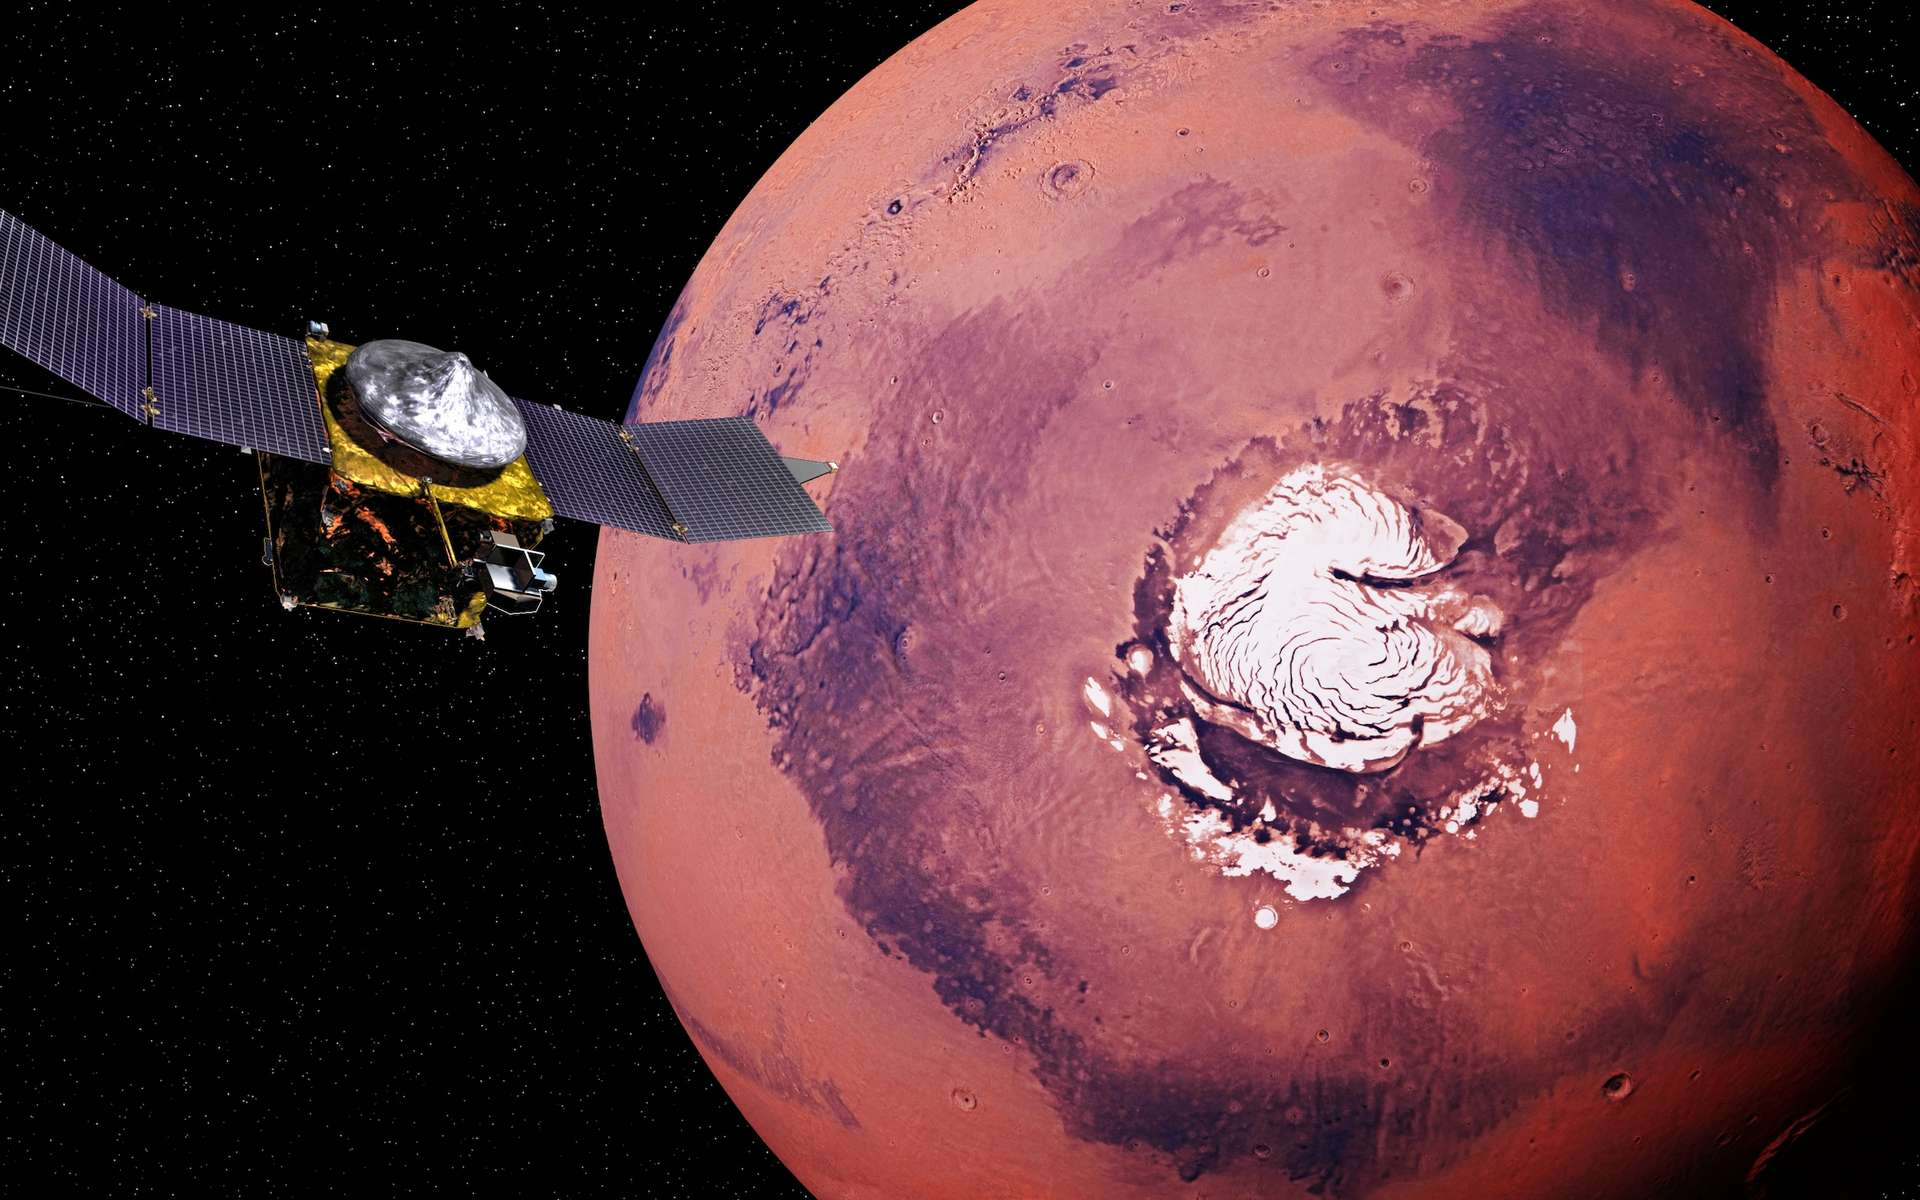 Illustration de la sonde Maven survolant le pôle nord de Mars. © dottedyeti, Adobe Stock